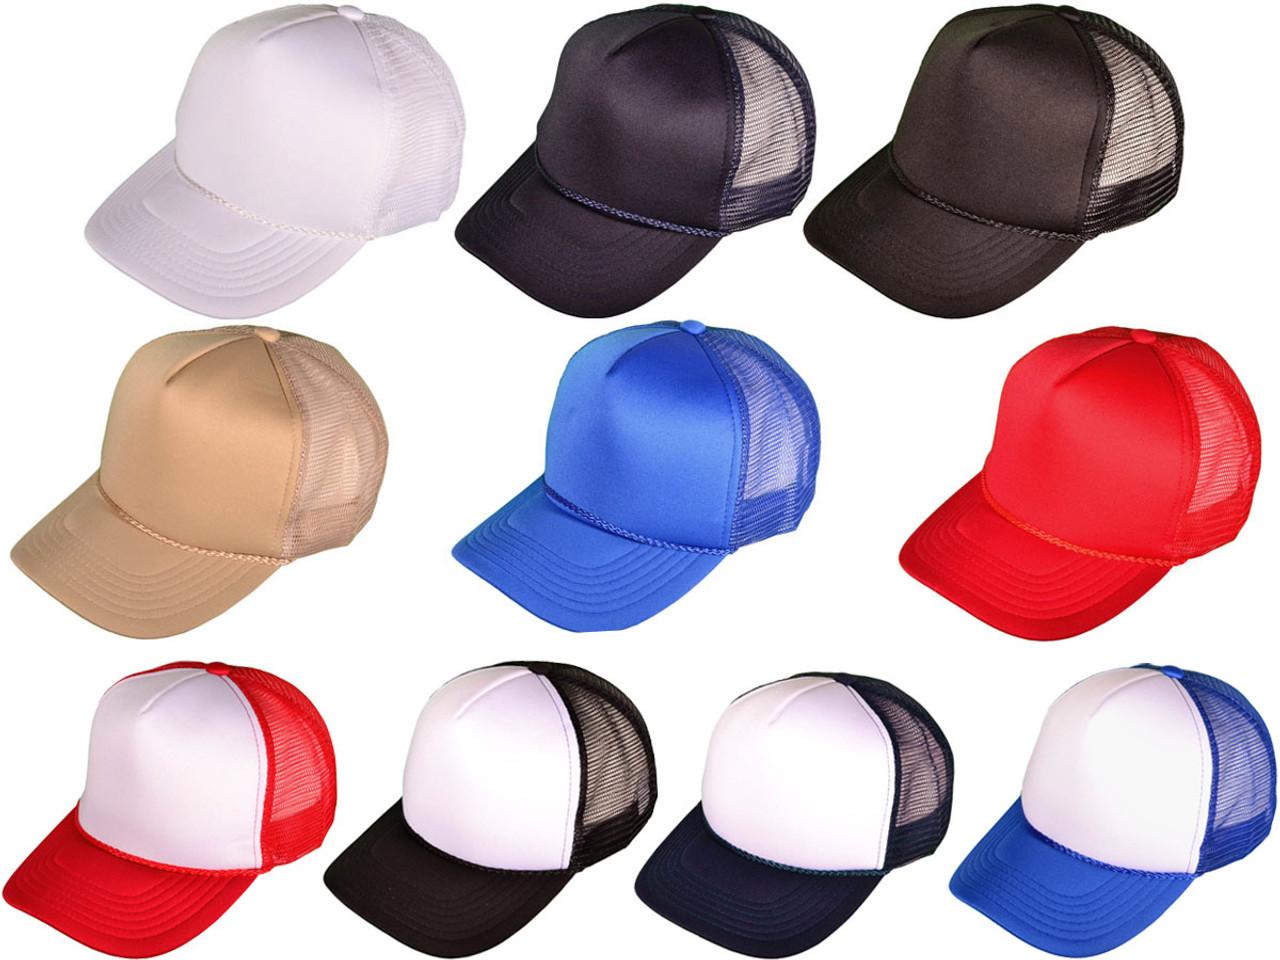 12 Black and White Foam//Mesh Trucker Hats Fast Shipping! 1 Dozen